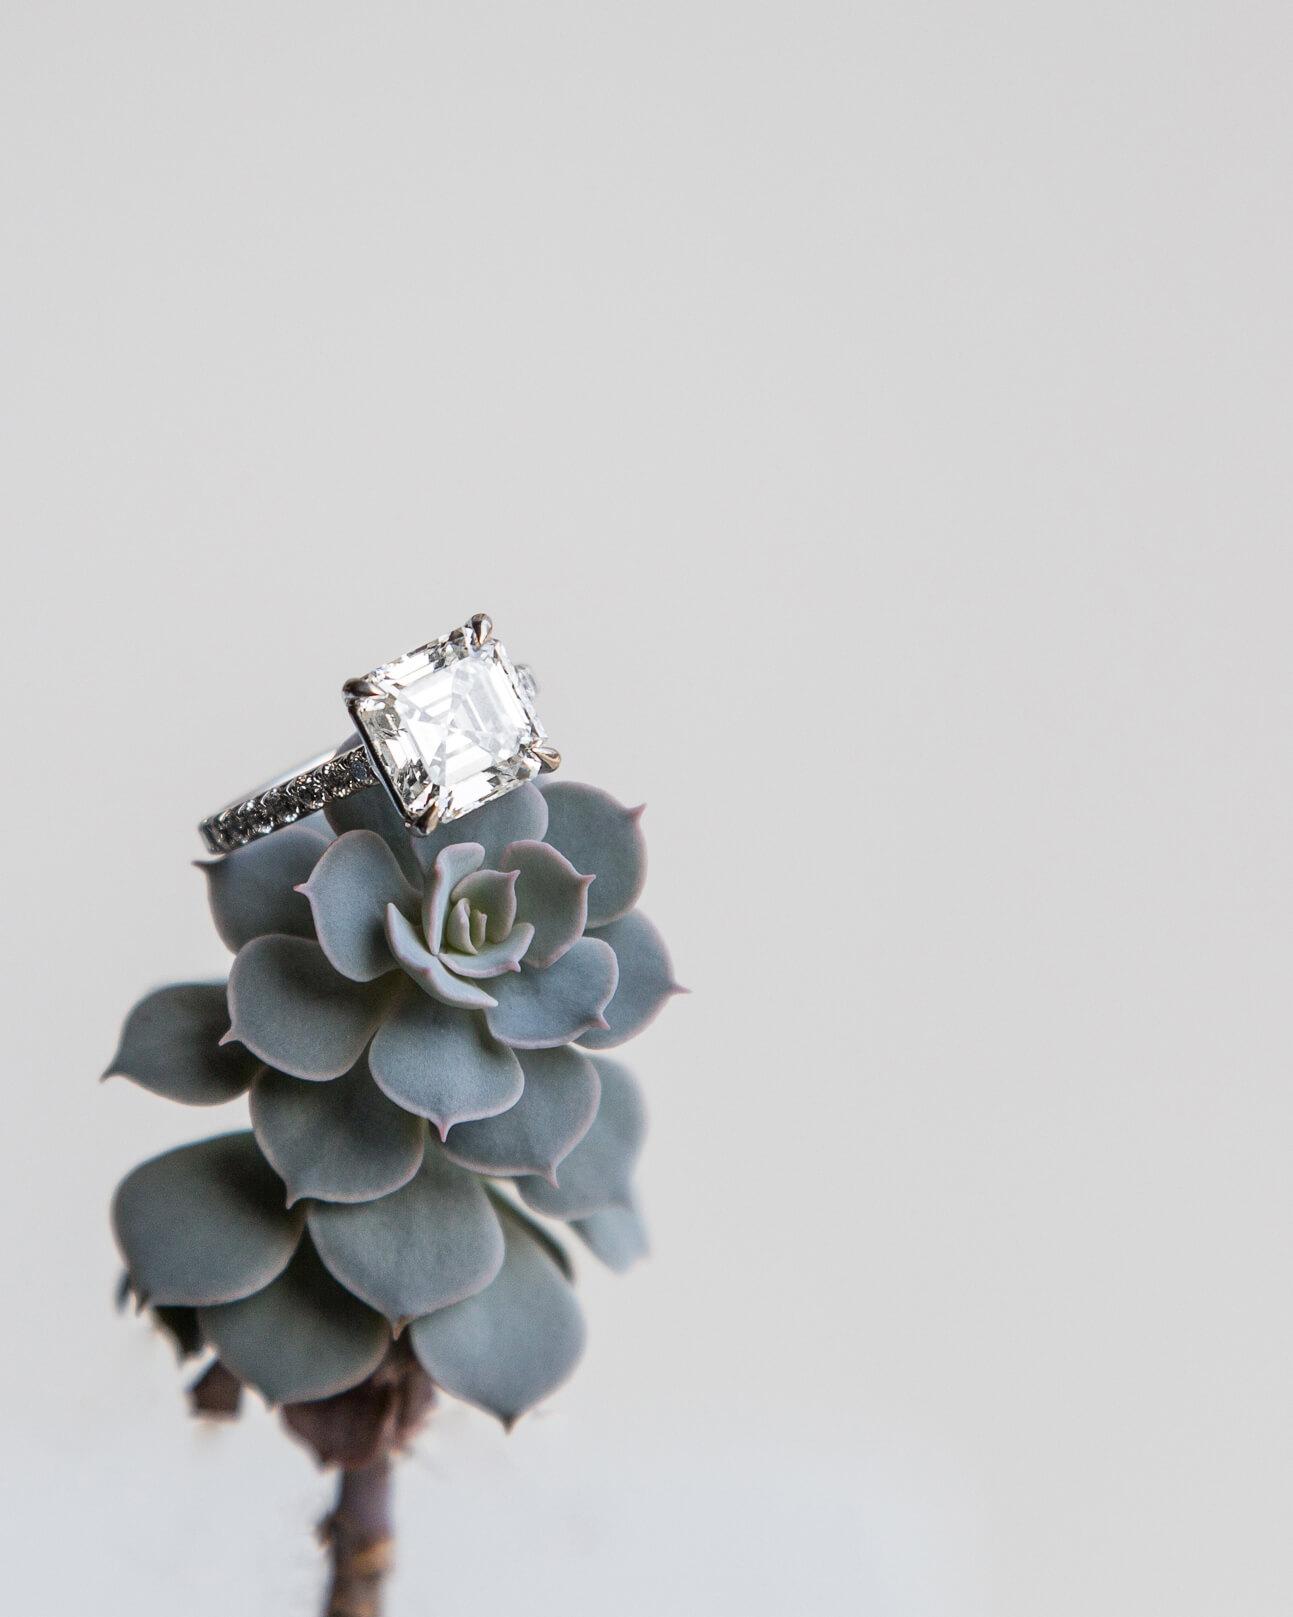 bogo-jewelry-photography.jpg